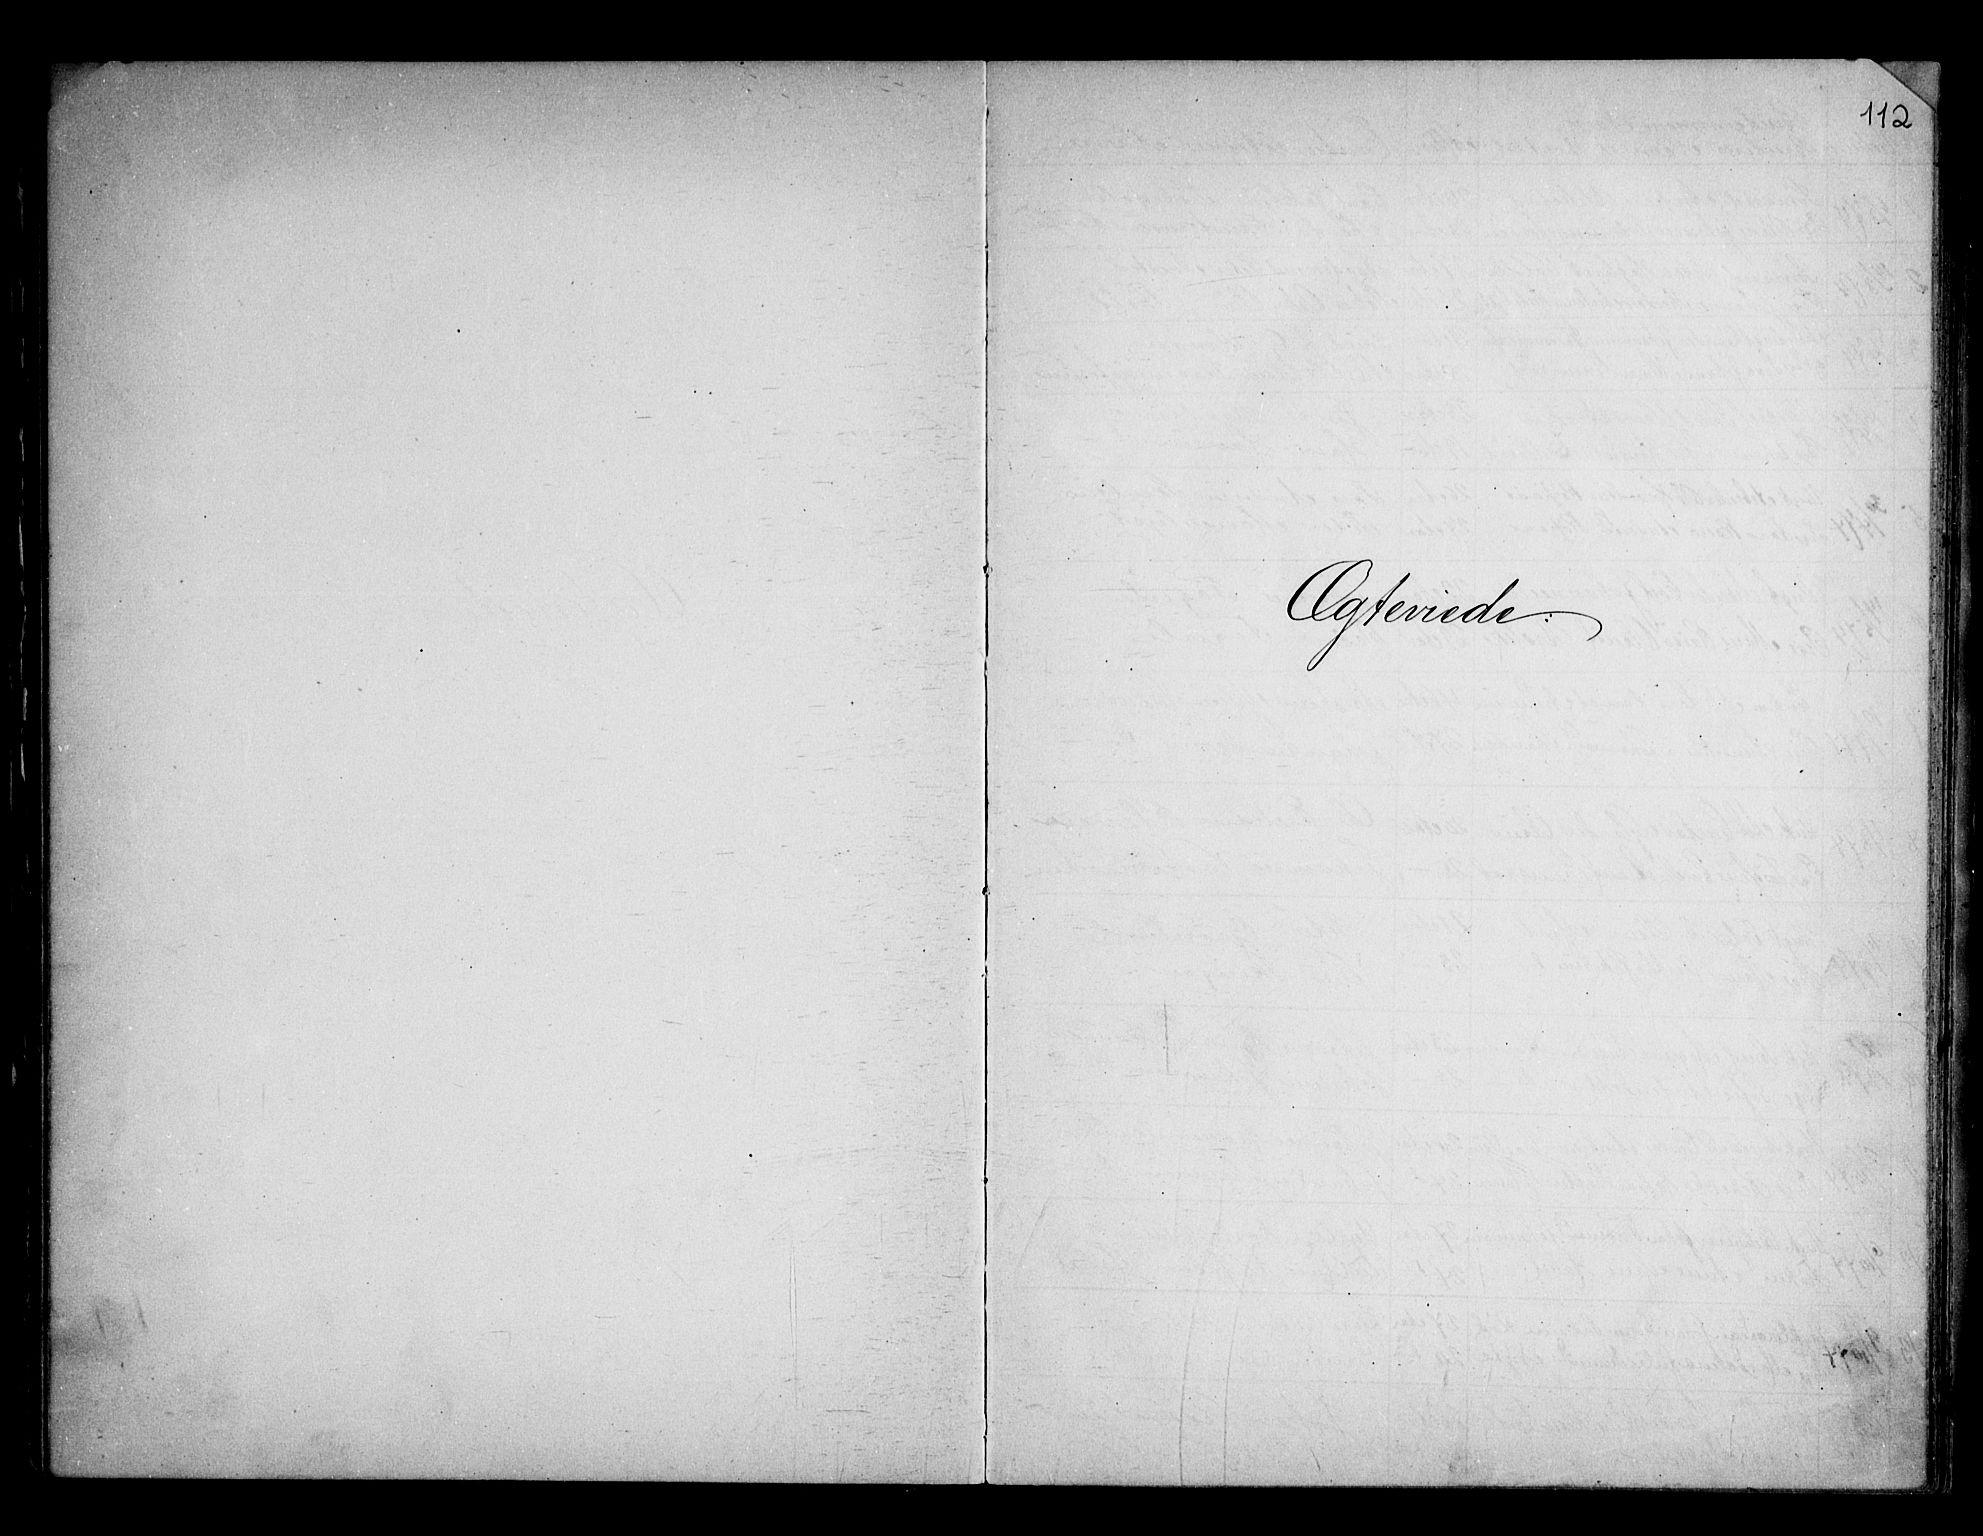 SAO, Berg prestekontor Kirkebøker, G/Gb/L0001: Klokkerbok nr. II 1, 1874-1946, s. 112